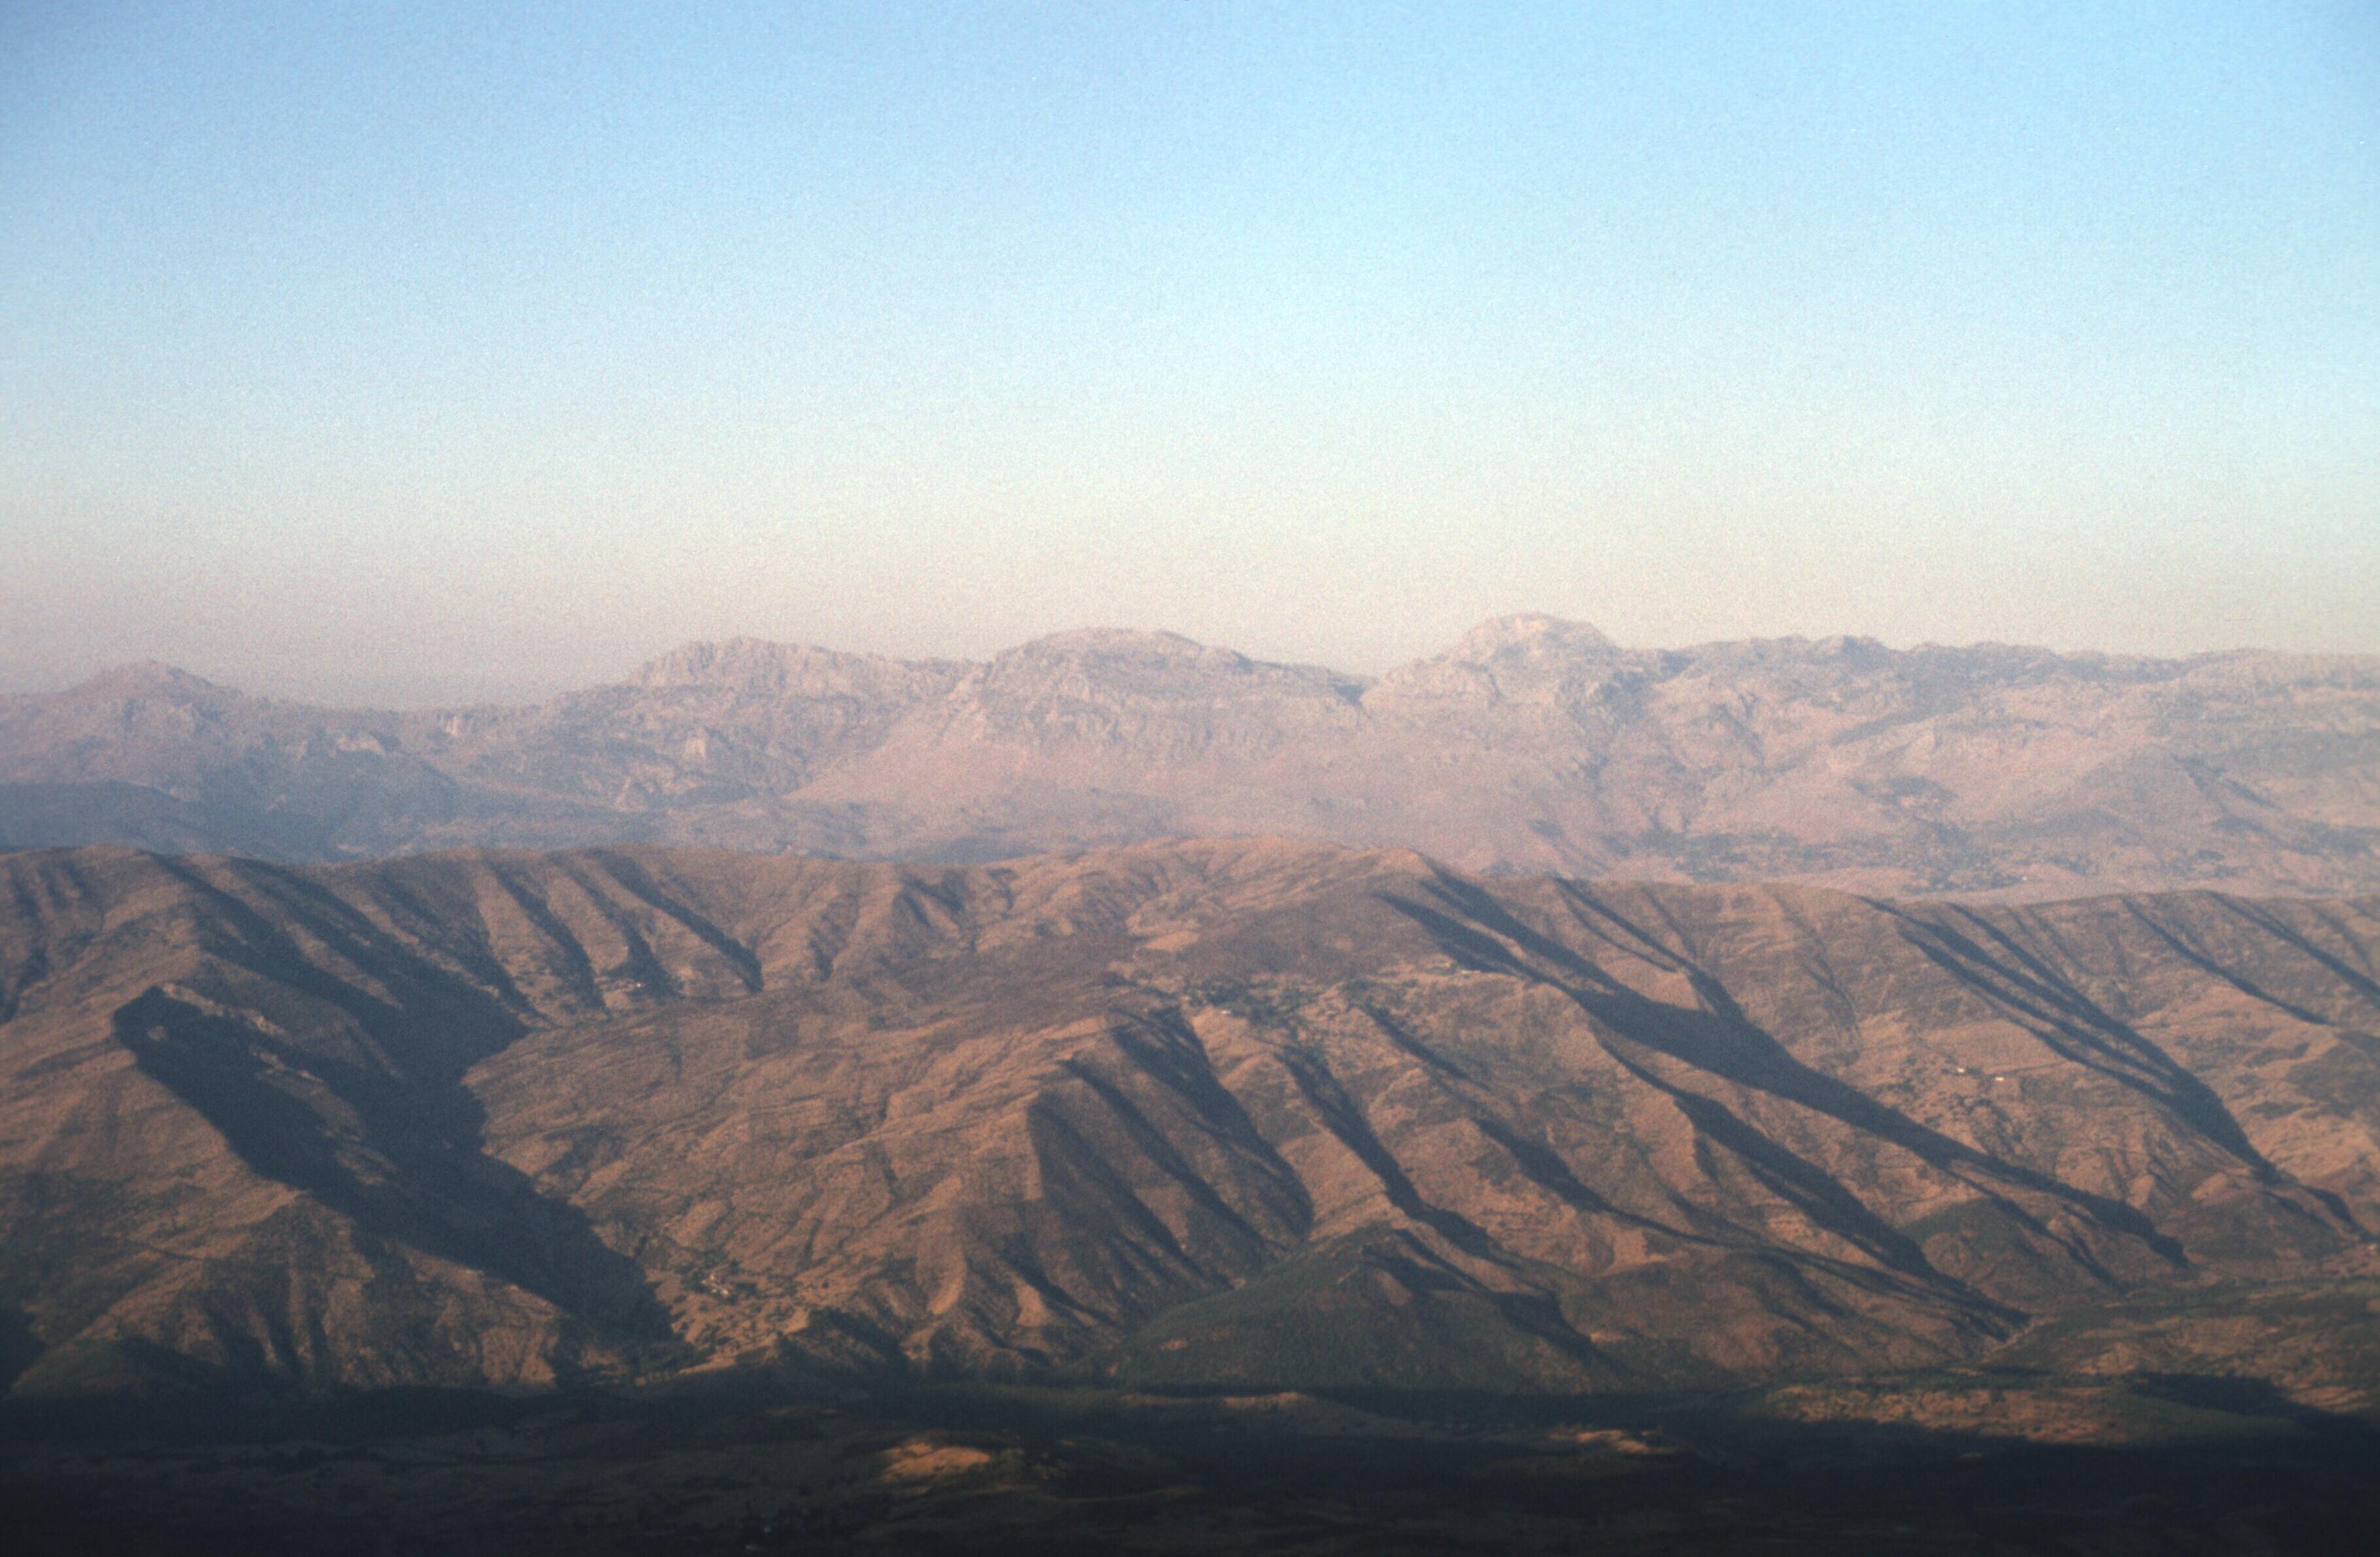 morocco rif m abdeslem chauen road